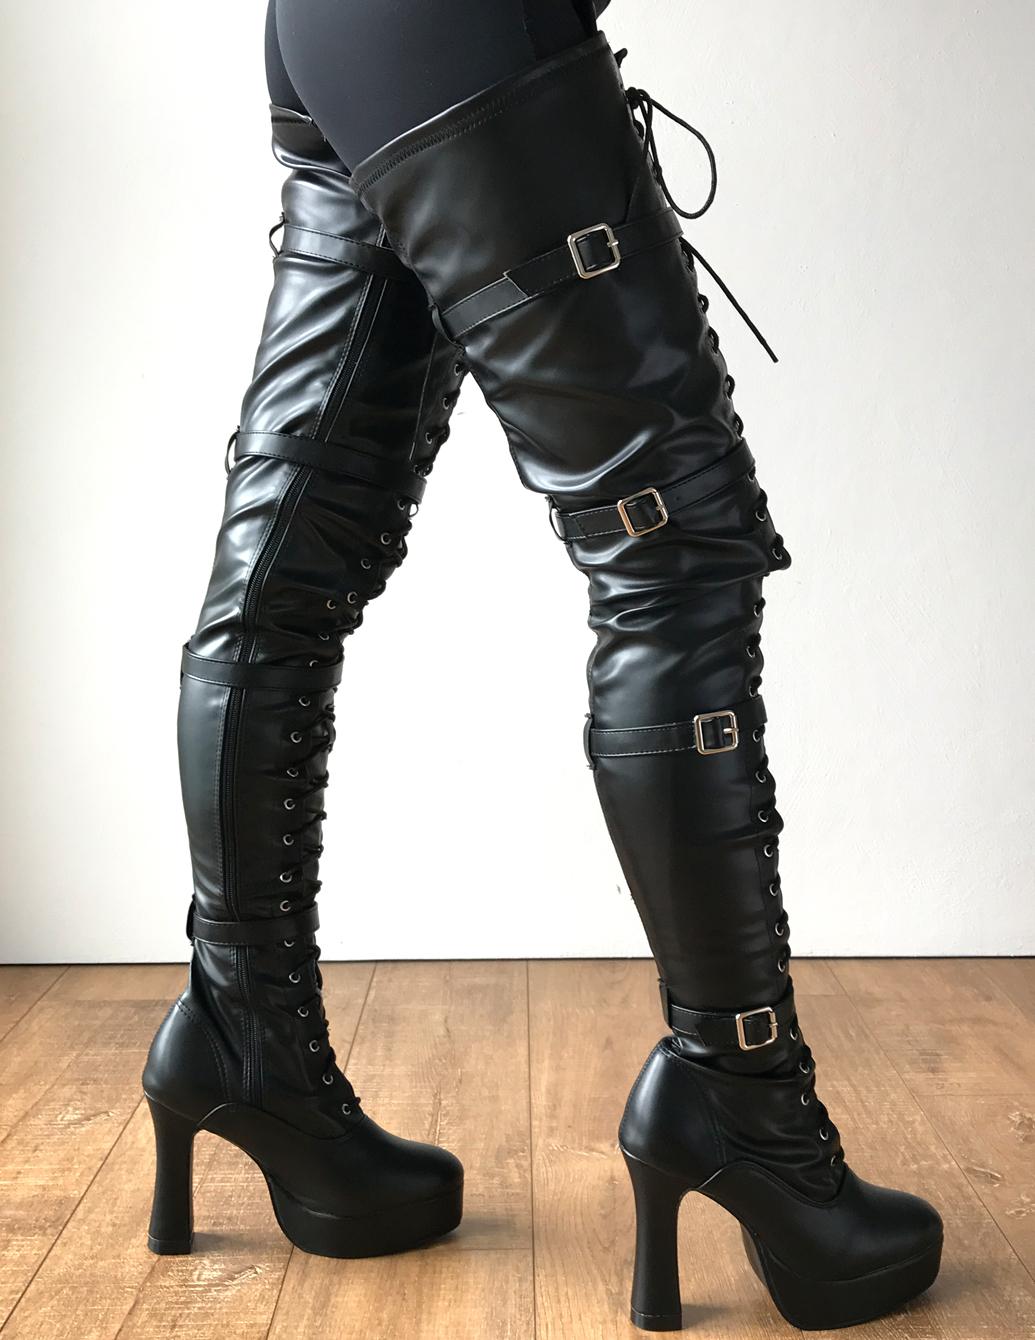 rebelsmarket_chuk_12cm_spool_heel_platform_crotch_goth_punk_pinup_cosplay_fetish_boots_boots_14.jpg